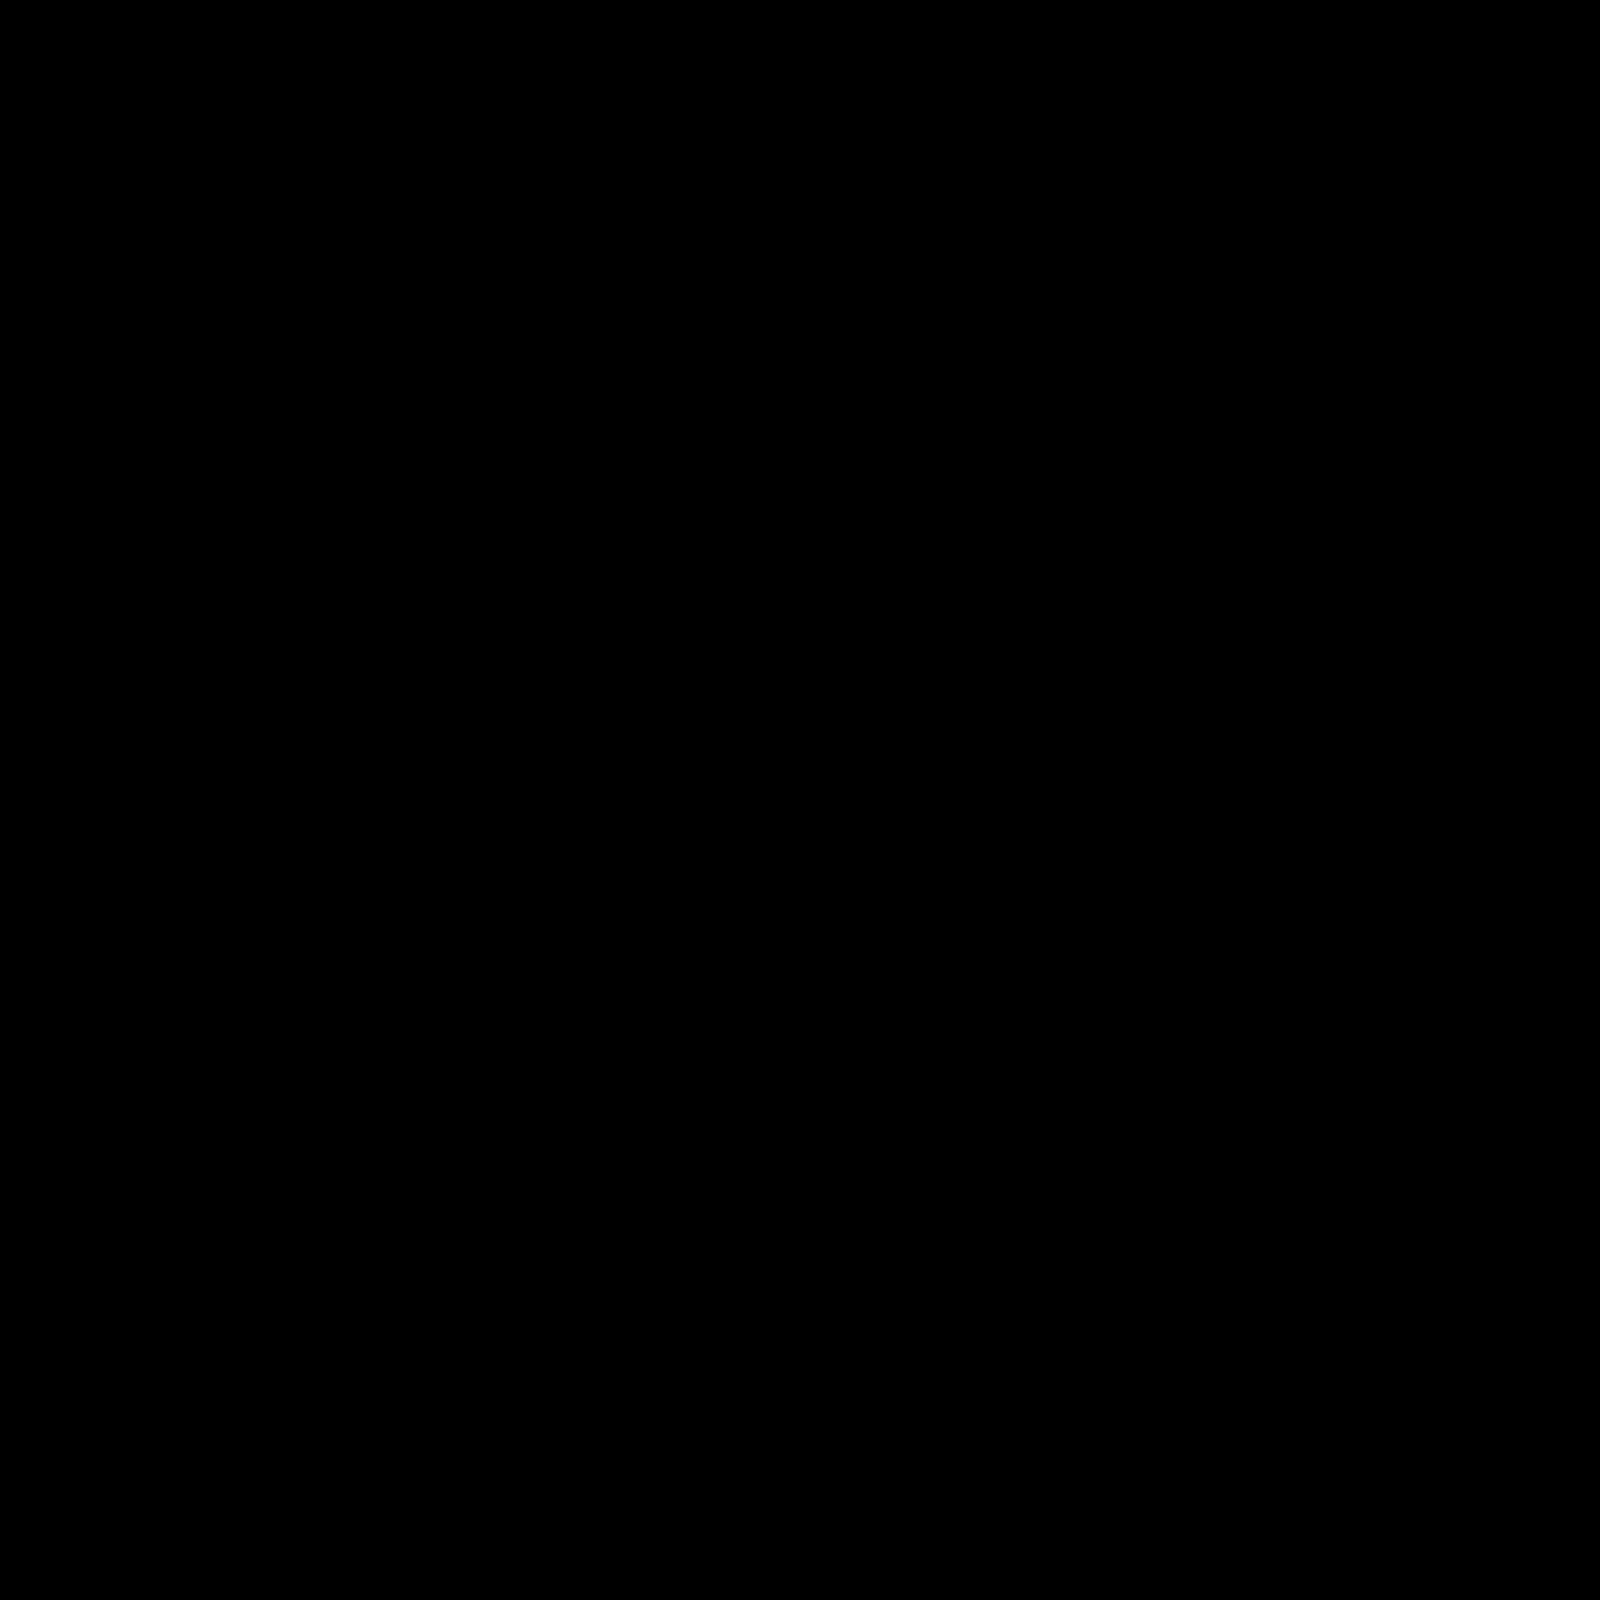 Wiertarka icon